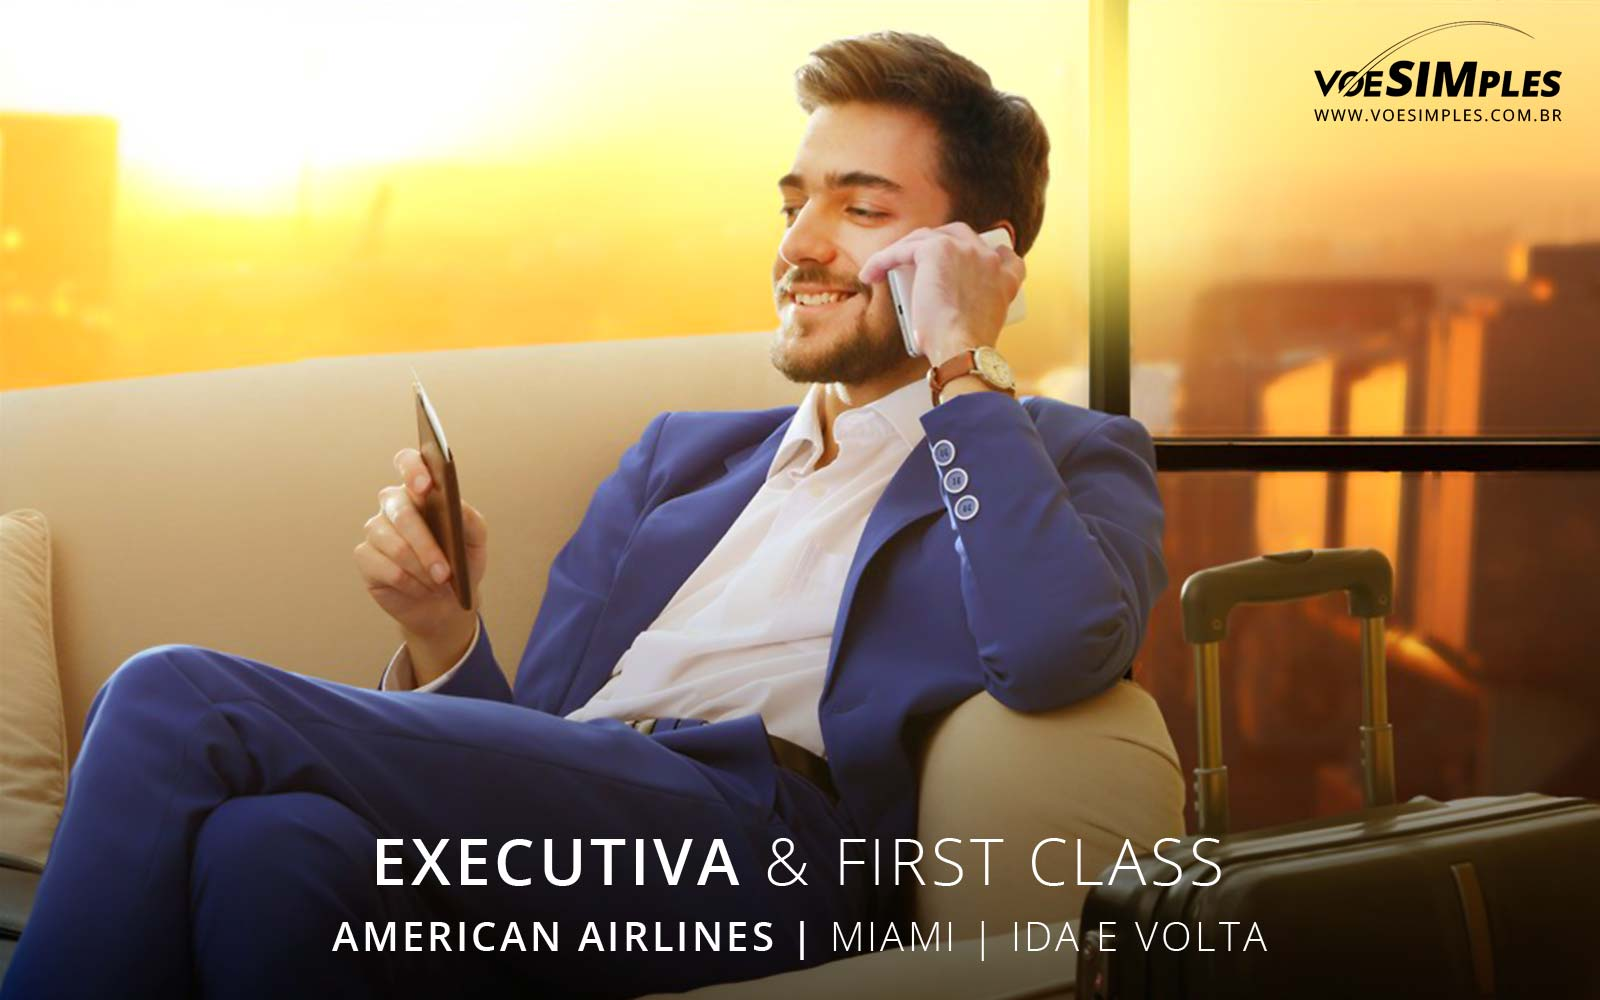 Passagem aérea executiva American Airlines